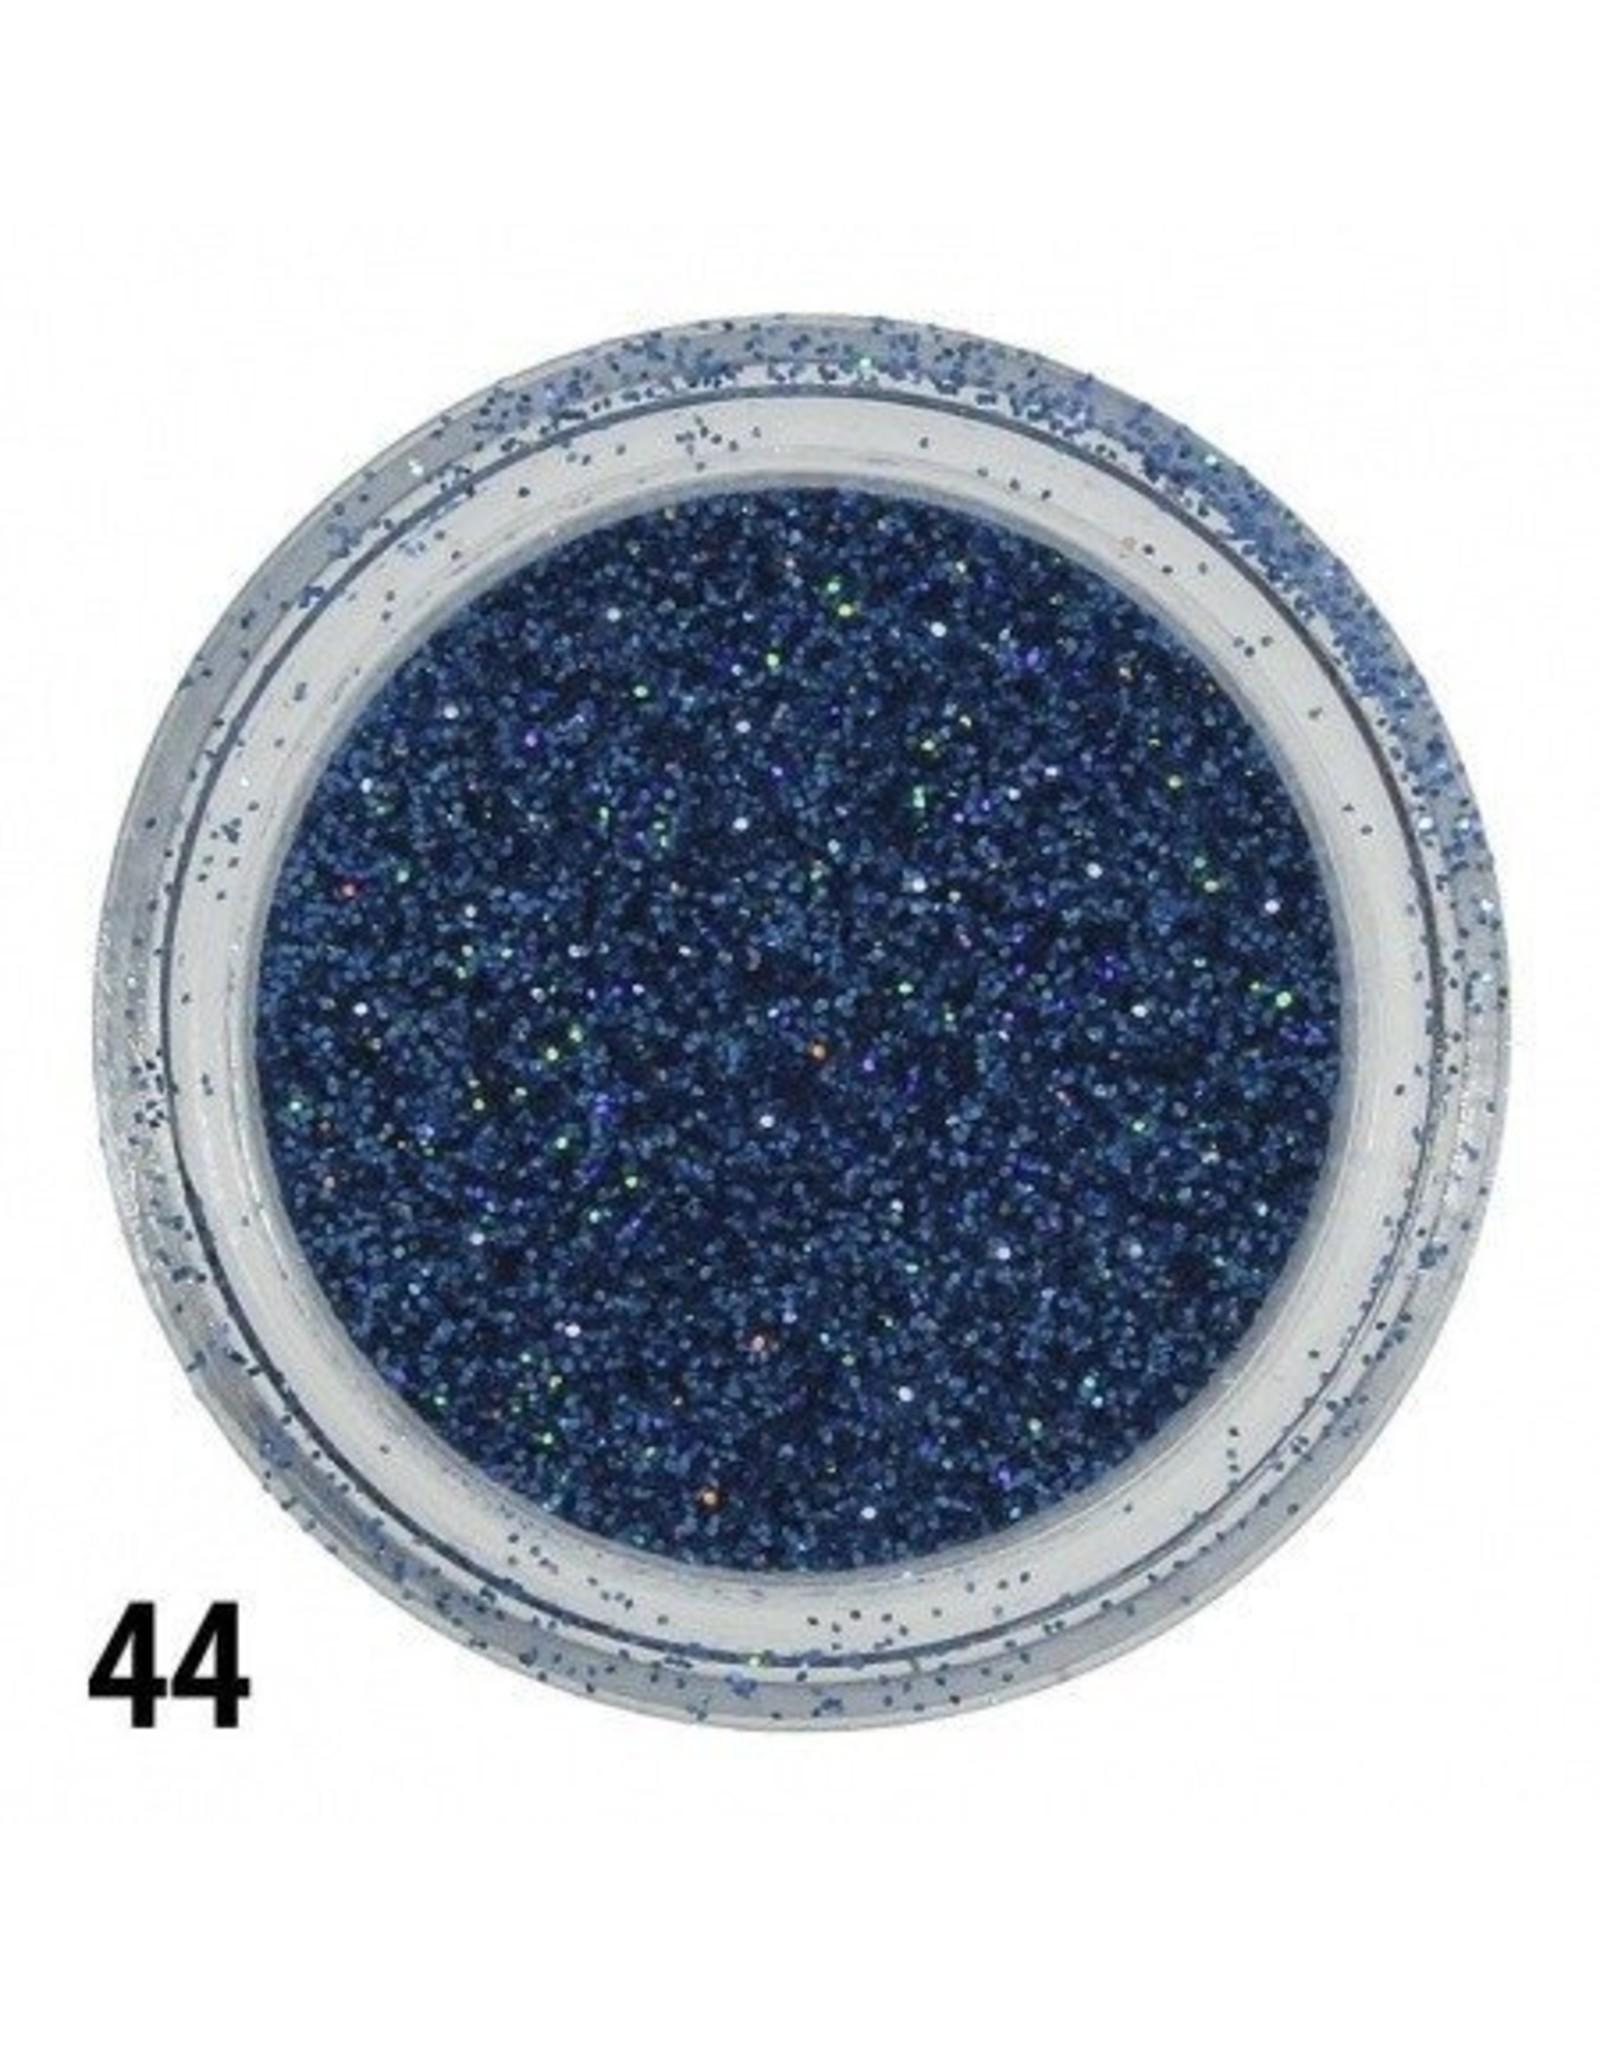 Merkloos Fijne Glitterpoeder